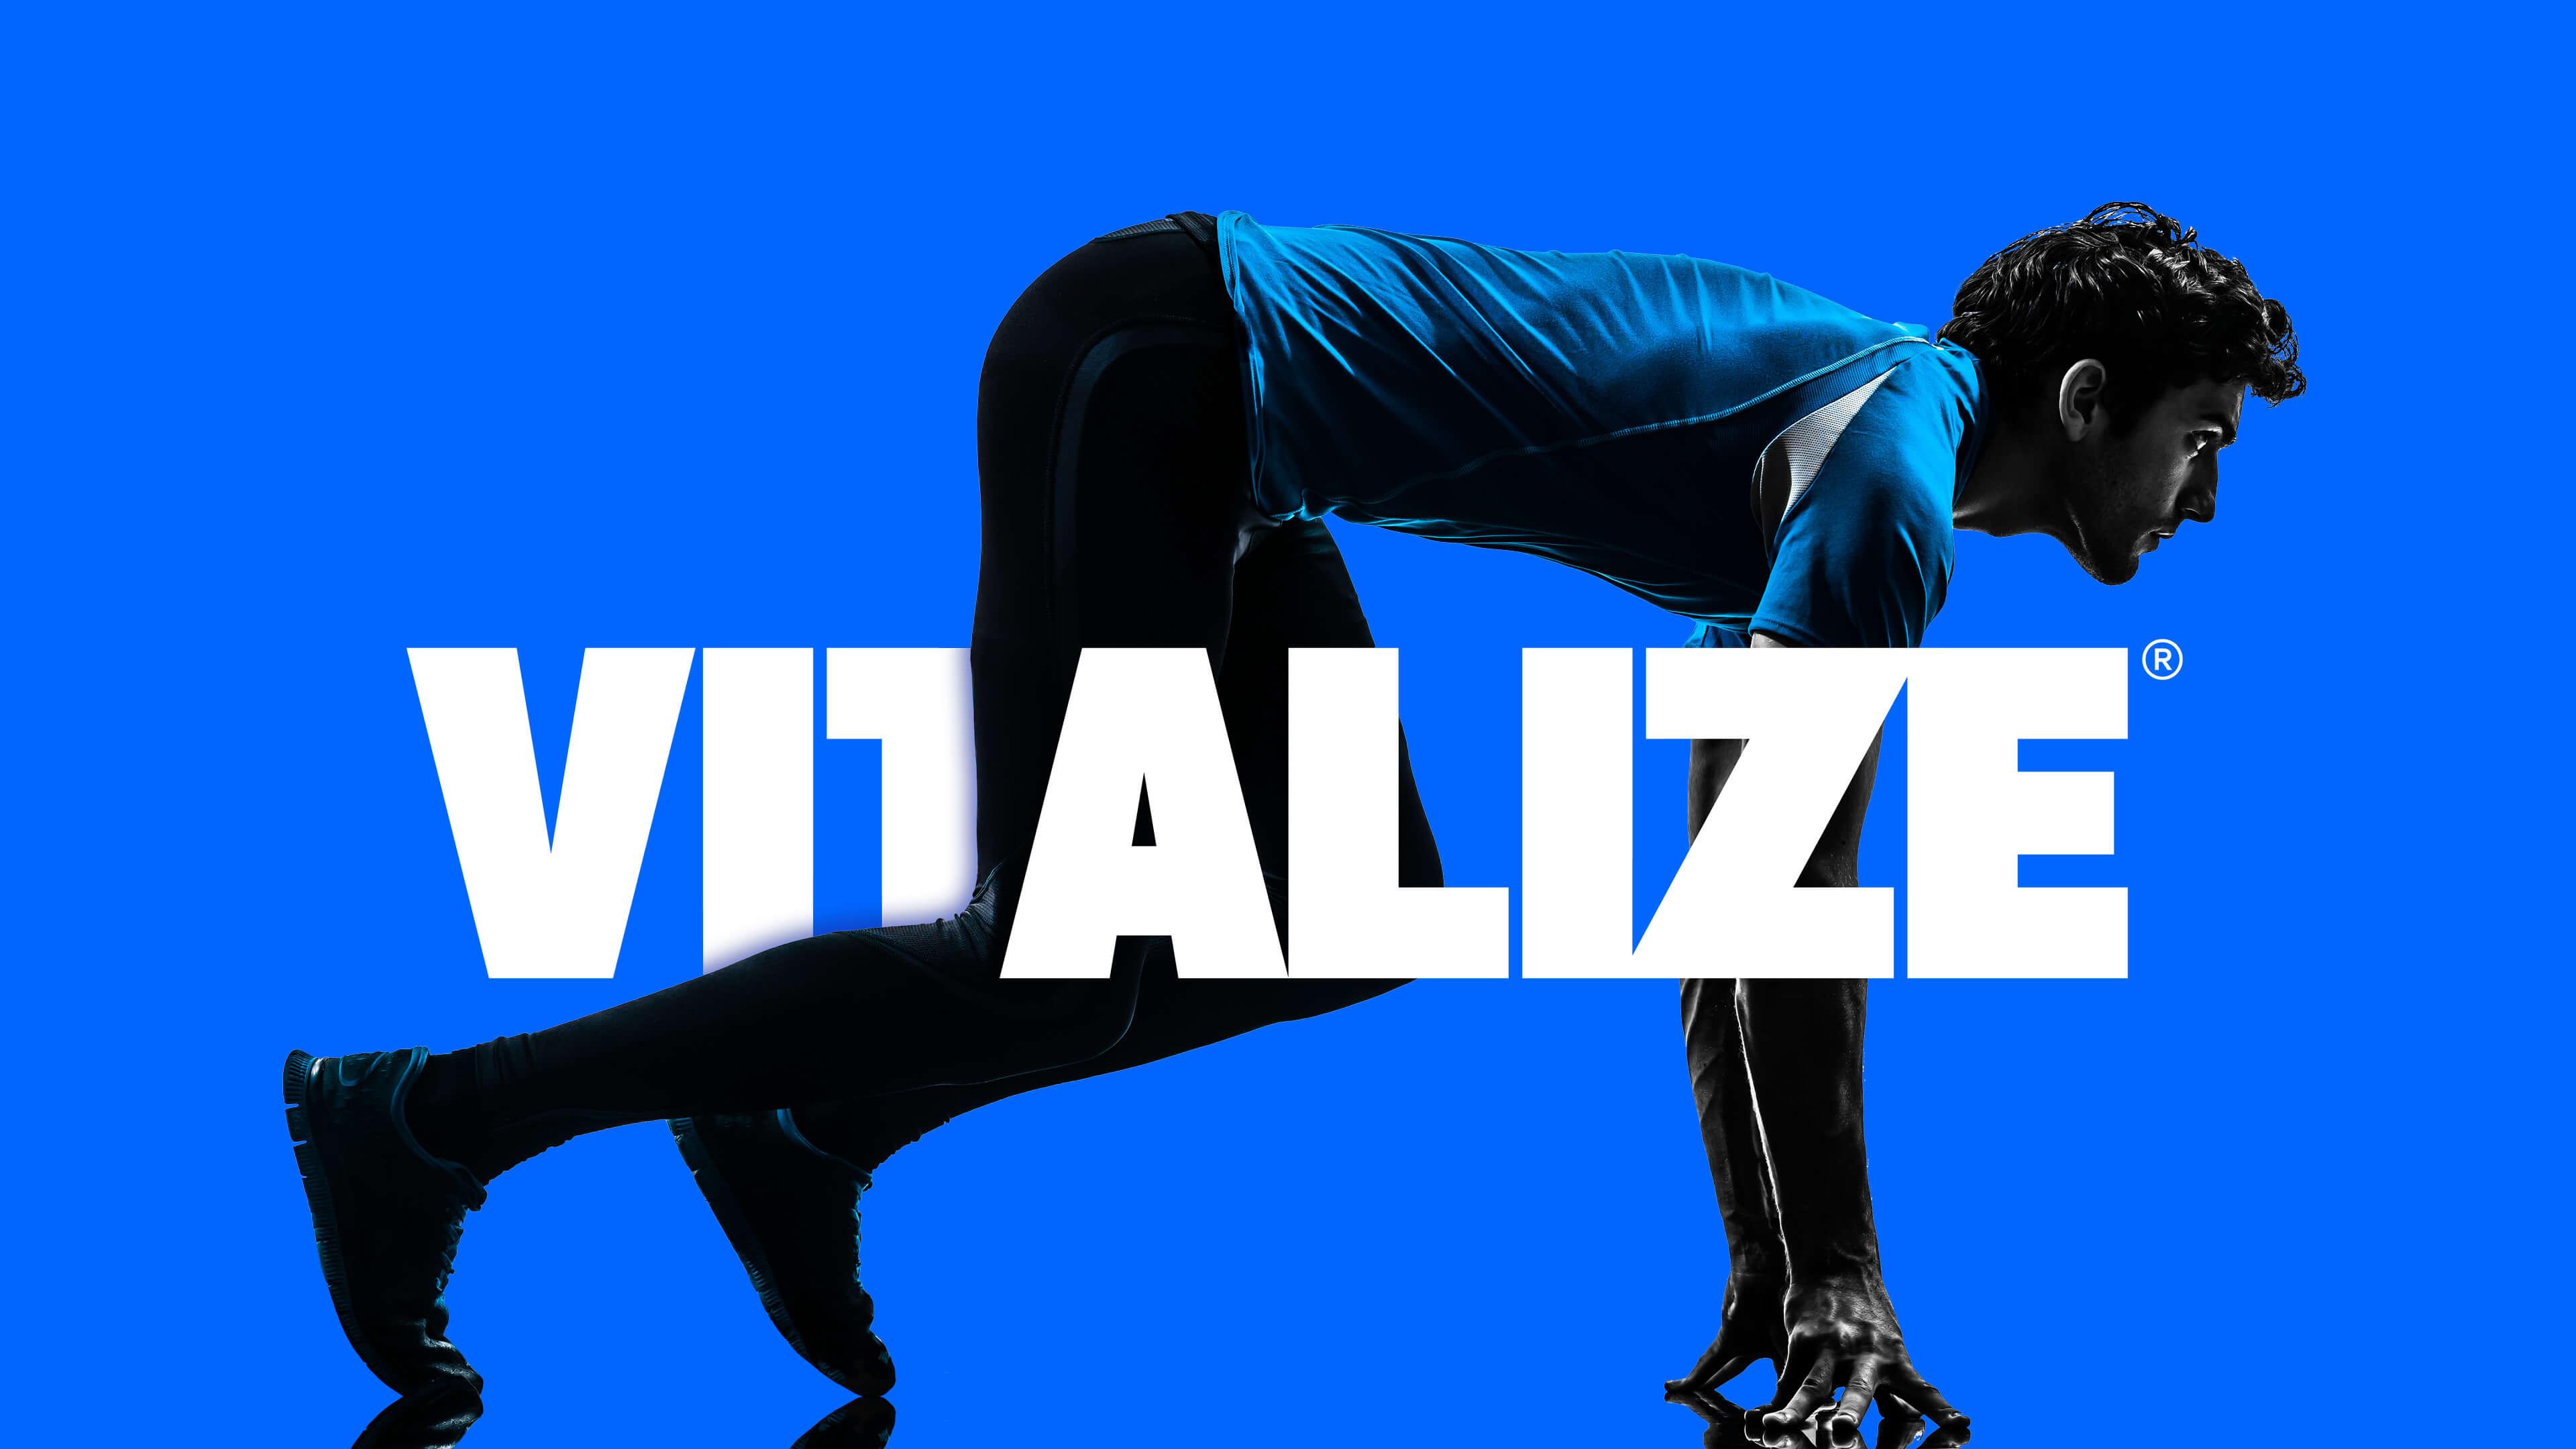 vitalize_001-new